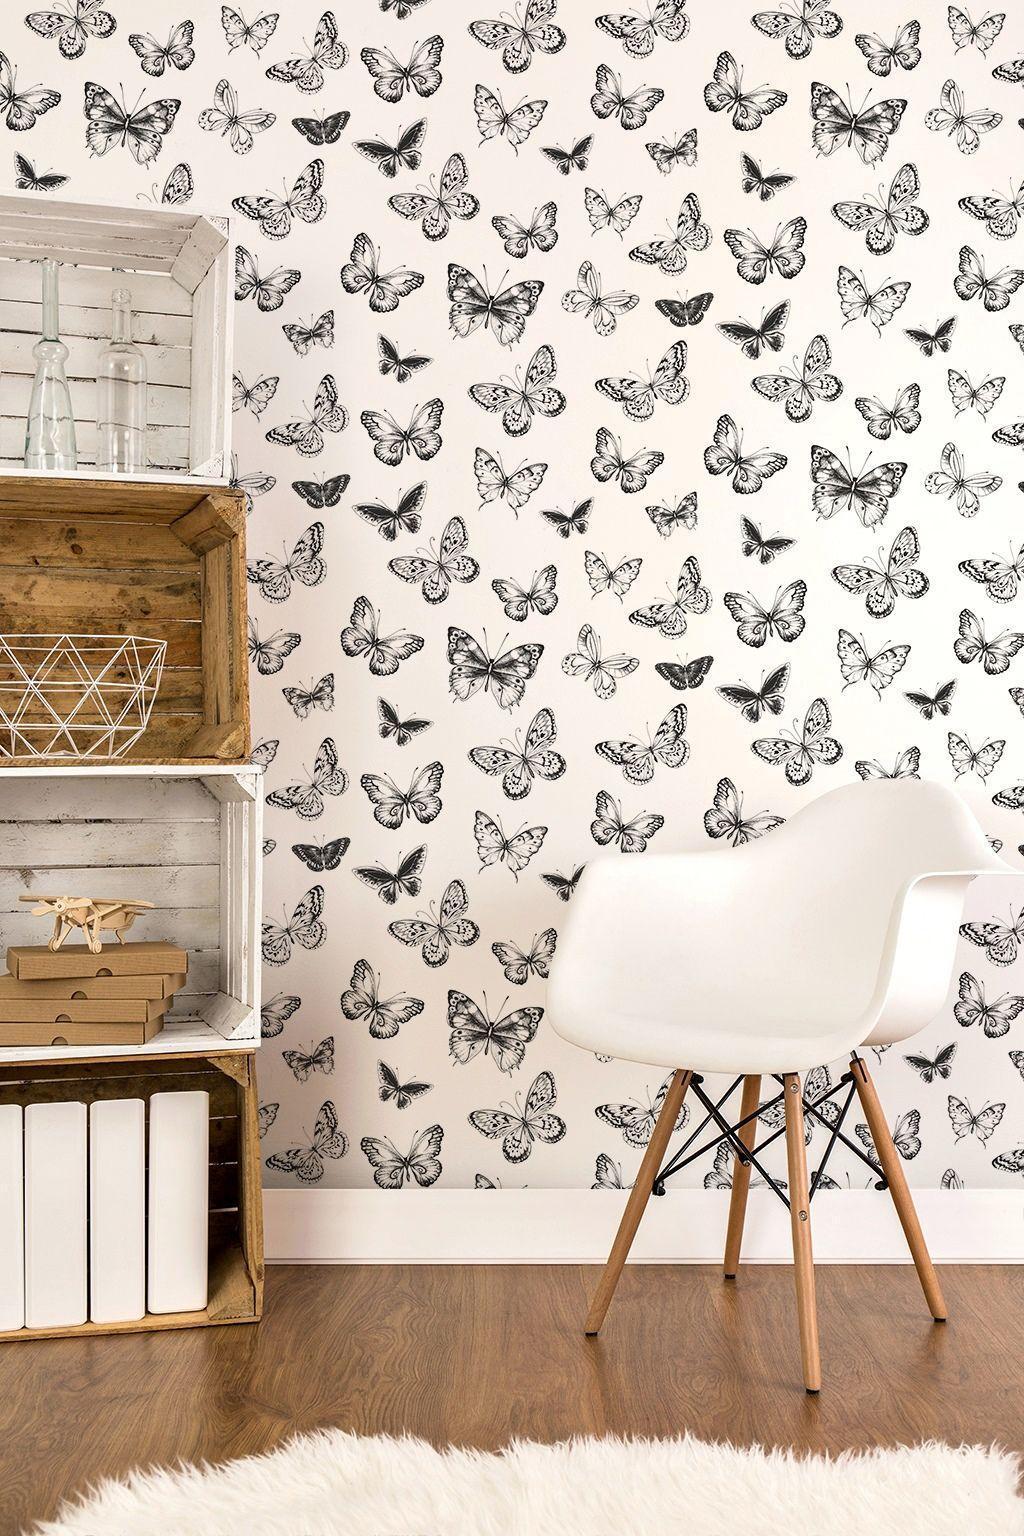 Papeles Pintados De Mariposas Ideales Para Decorar Cualquier Pared  ~ Papeles Decorativos Para Paredes